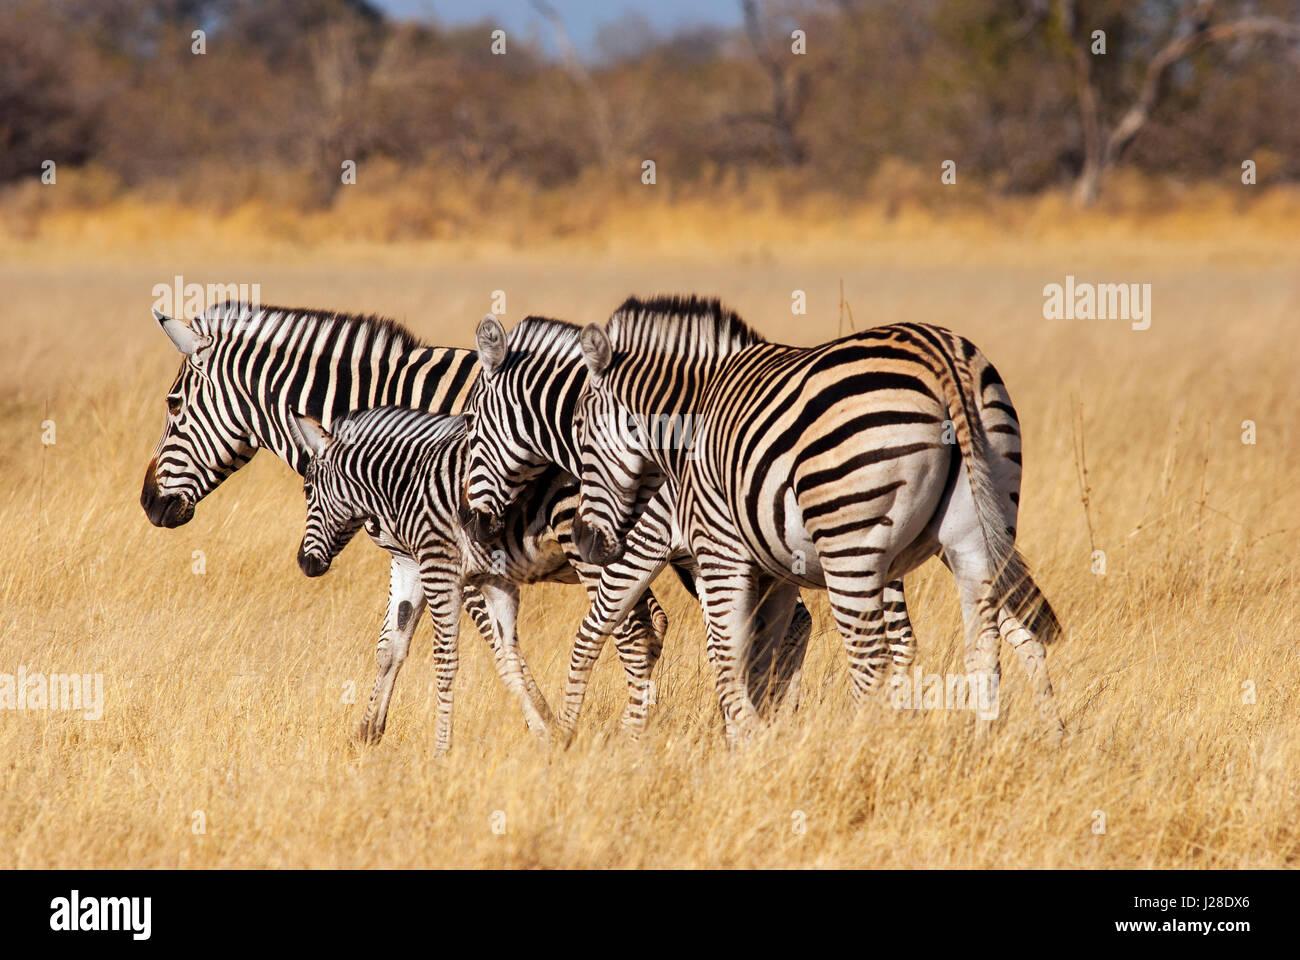 Zebras at Central Kalahari Game Reserve, Botswana - Stock Image